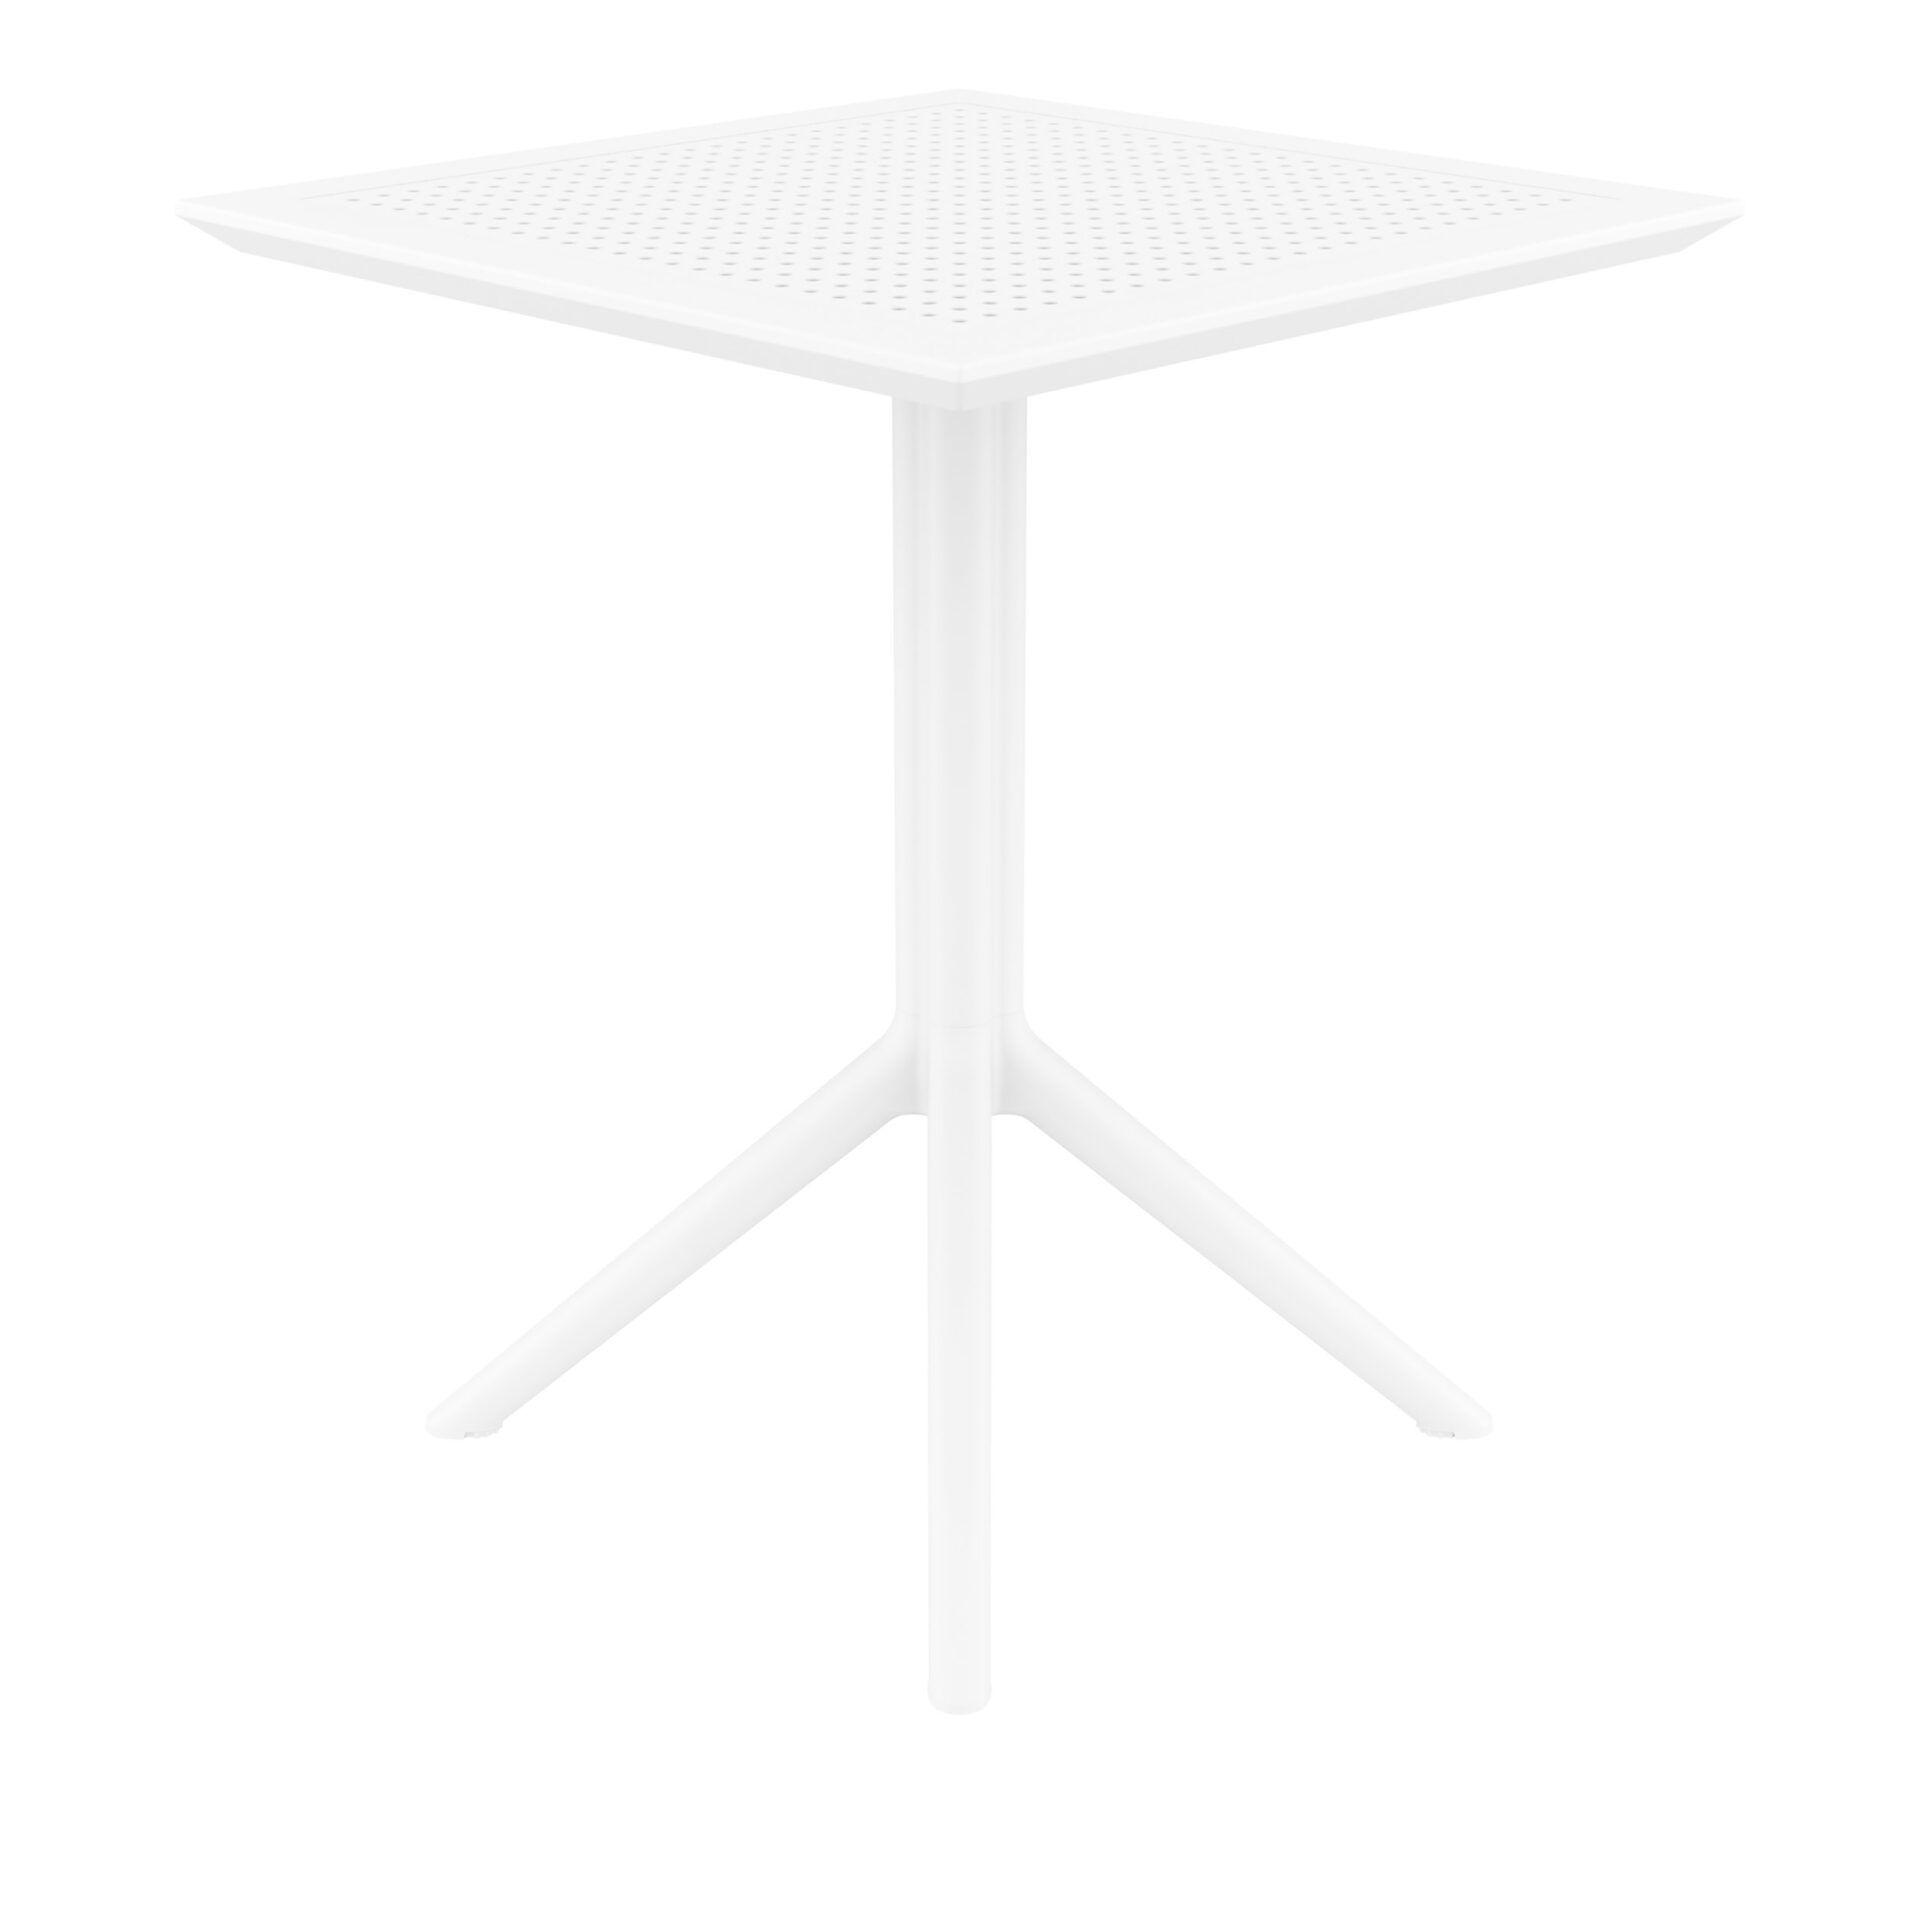 polypropylene outdoor sky folding bar table 60 white side